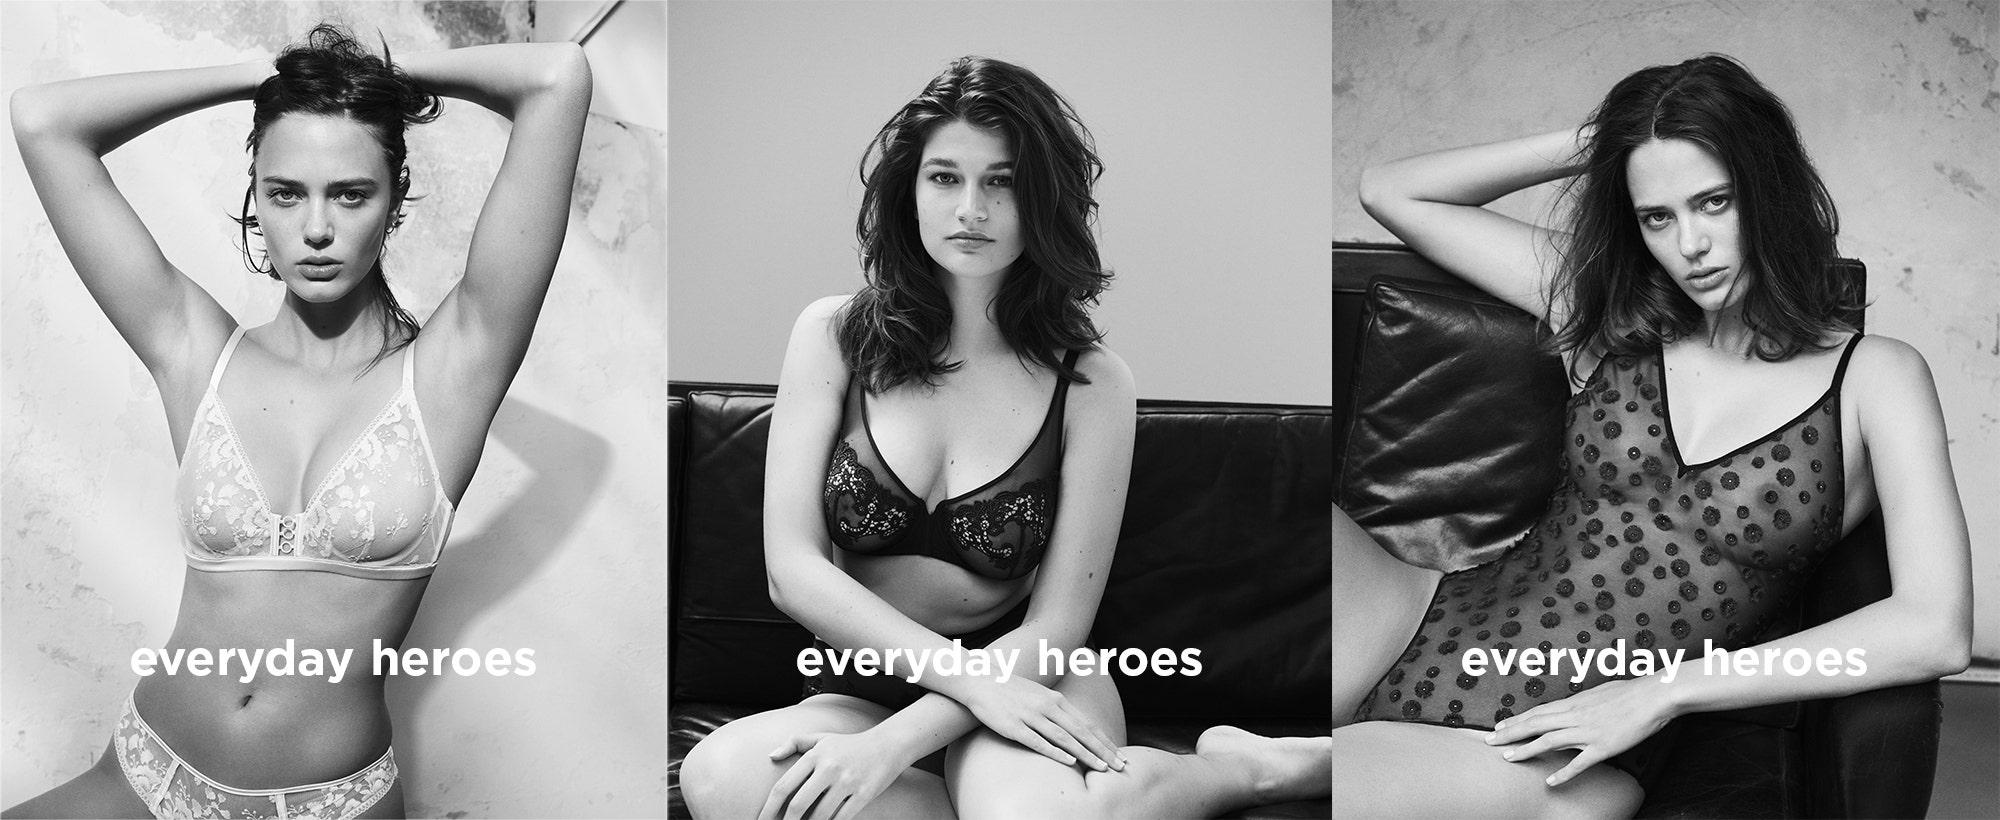 Everday heroes collection by Simone Pérèle : ORPHÉE, SAGA, CASSIE | Simone Pérèle